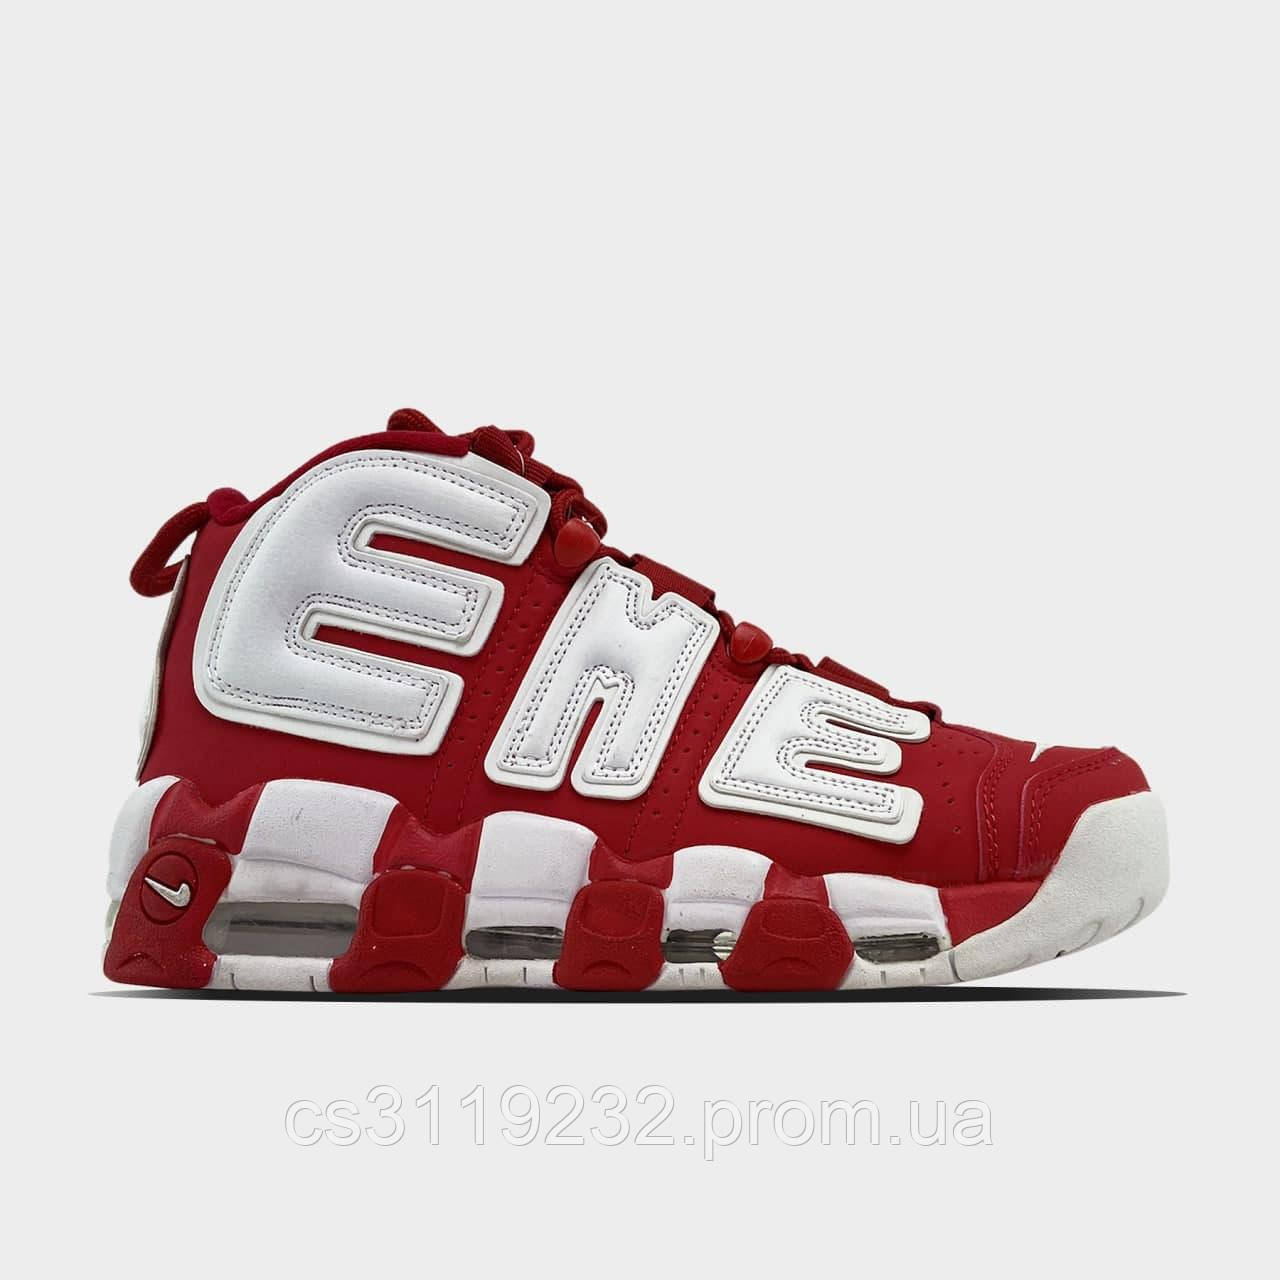 Мужские кроссовки Nike Air More Uptempo Red Supreme (красно-белые)